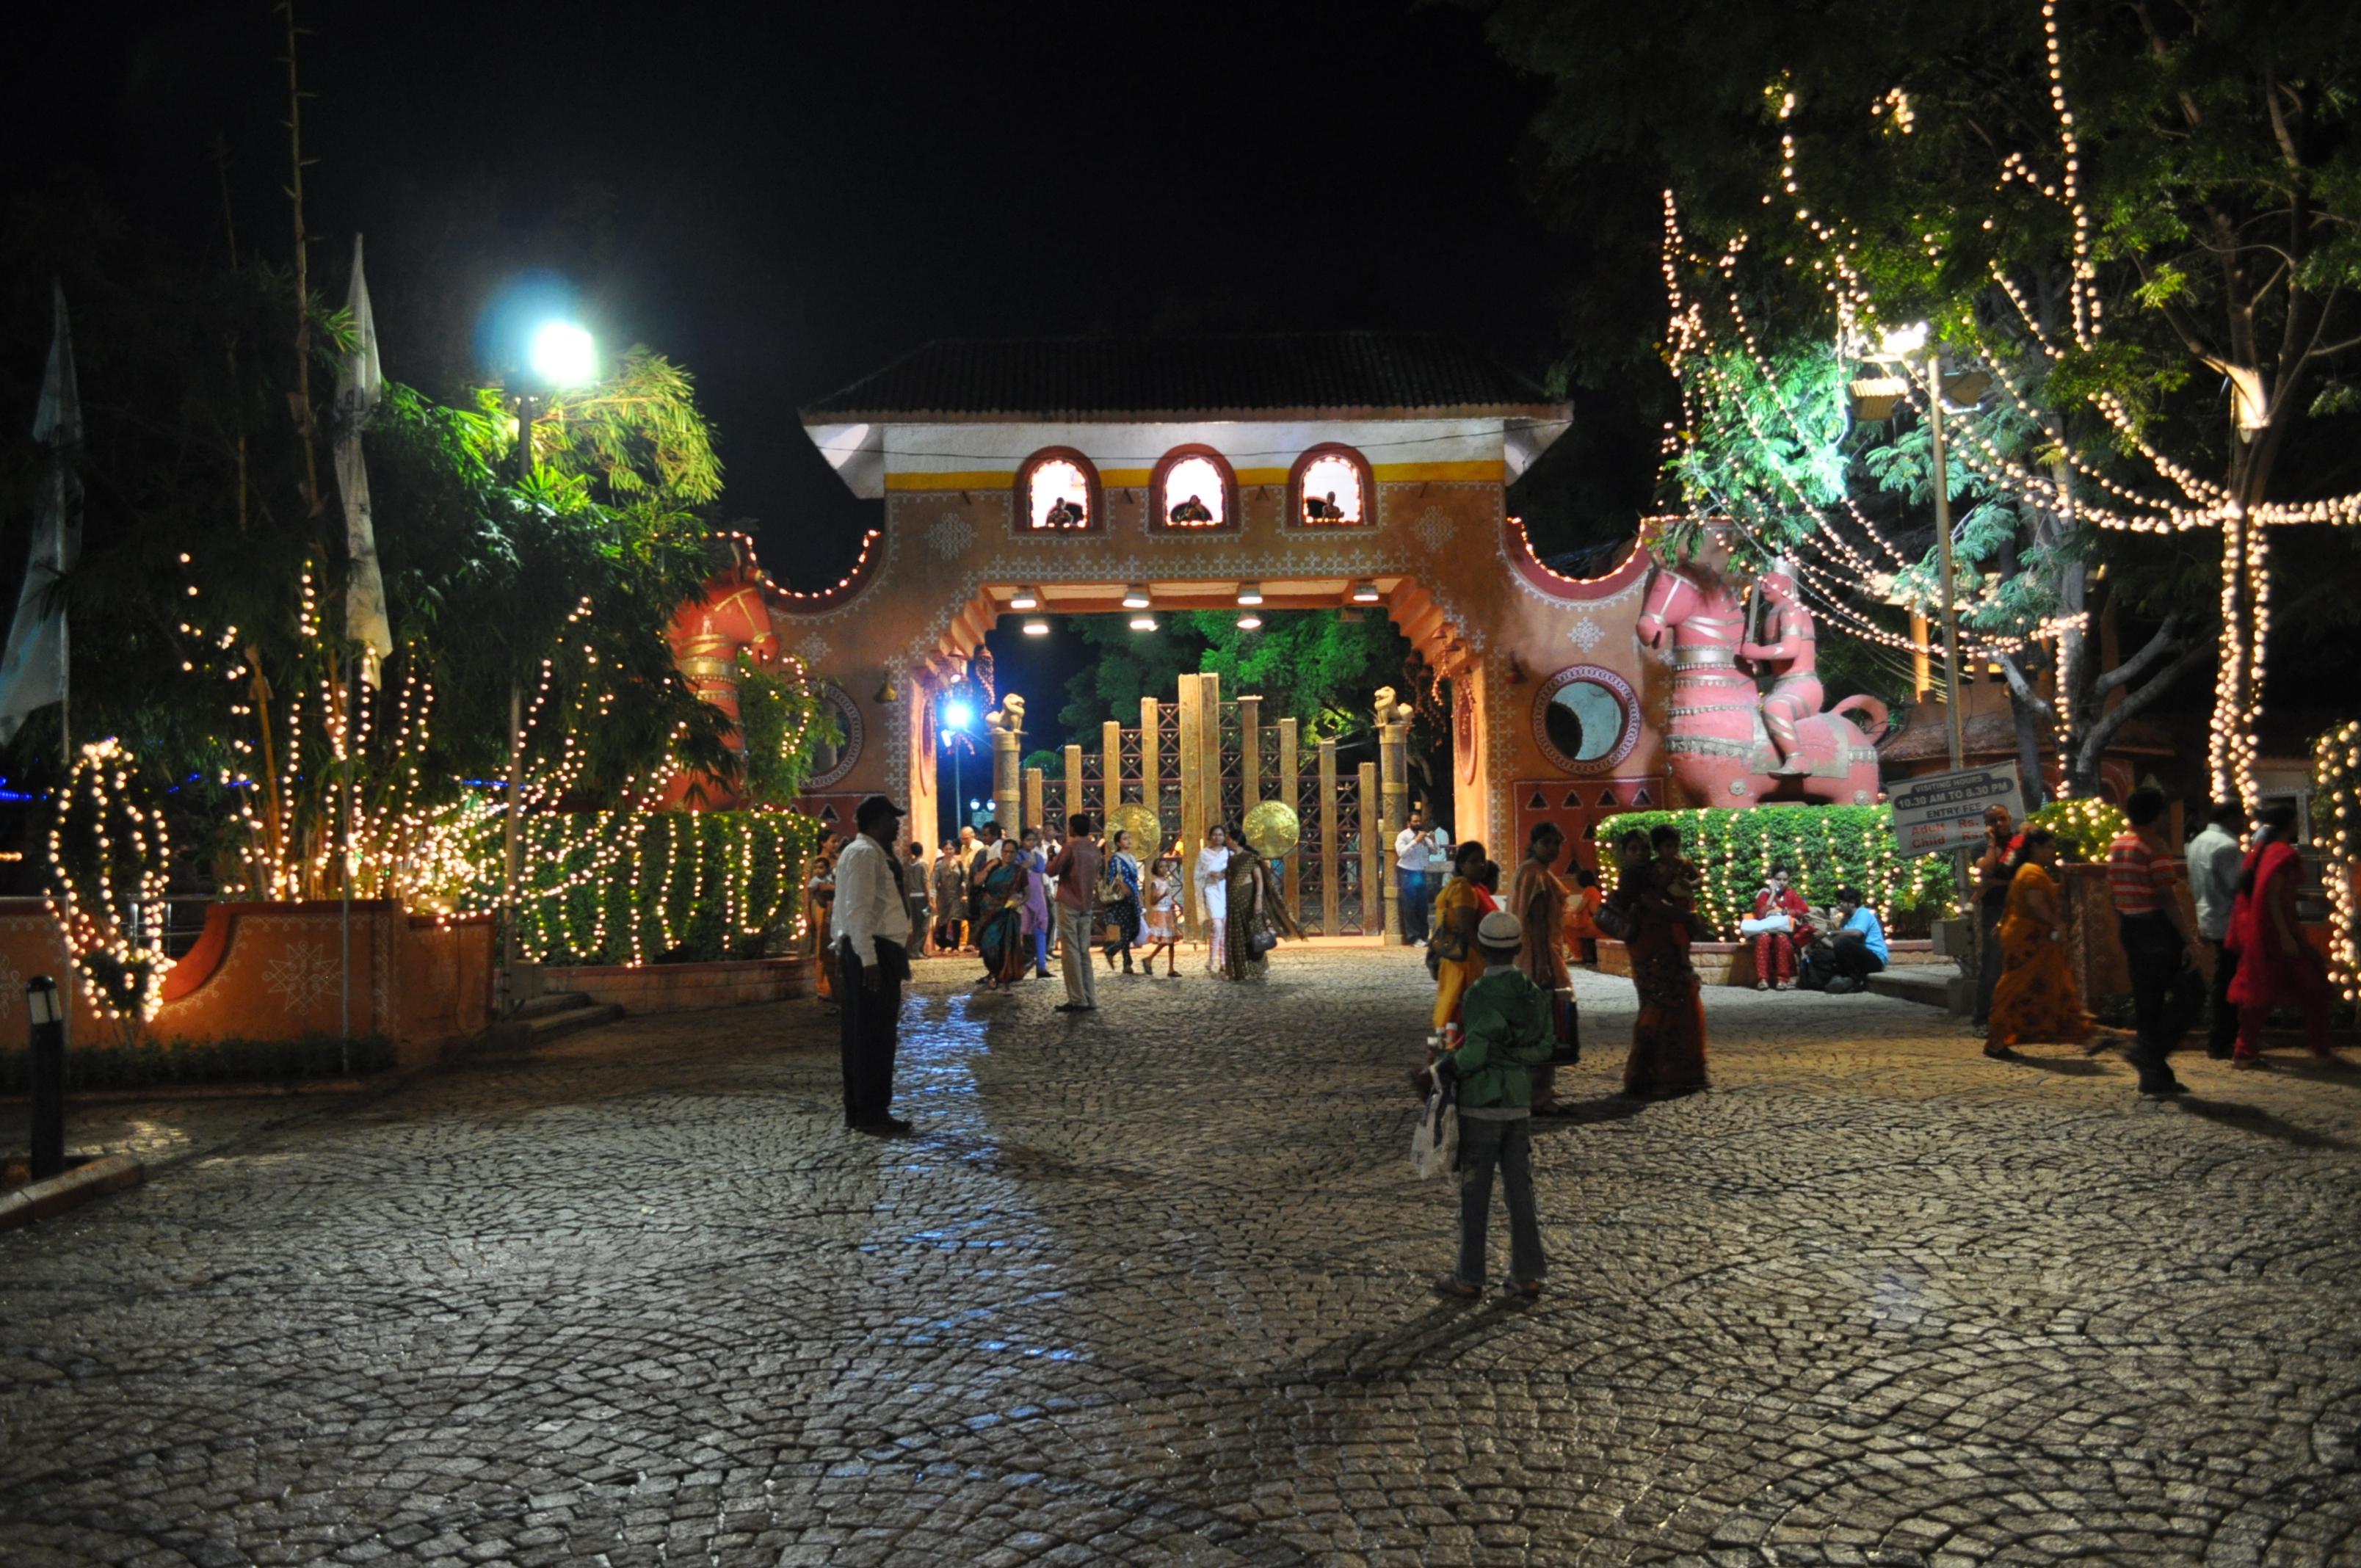 Shilparamam Cultural Society